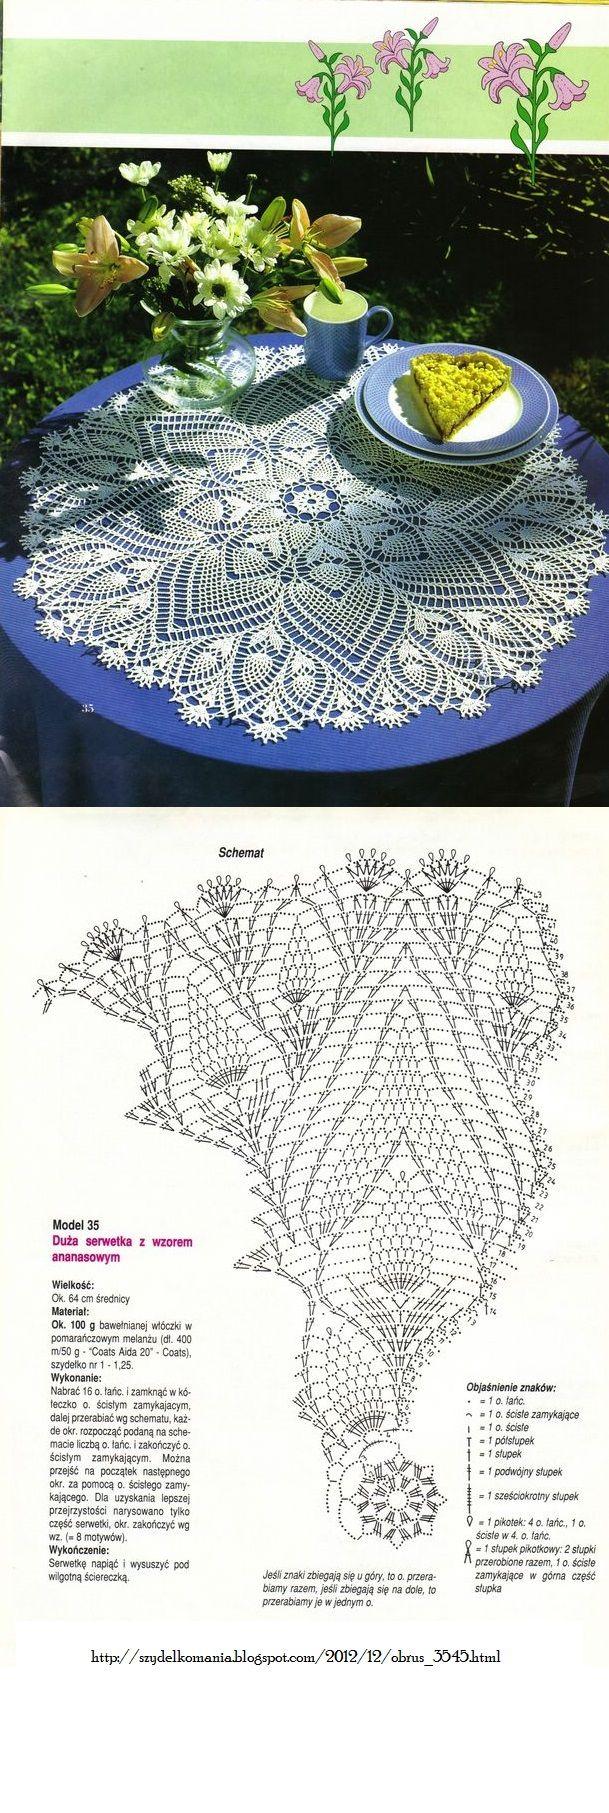 #_SUE Crochet Doily with diagram.